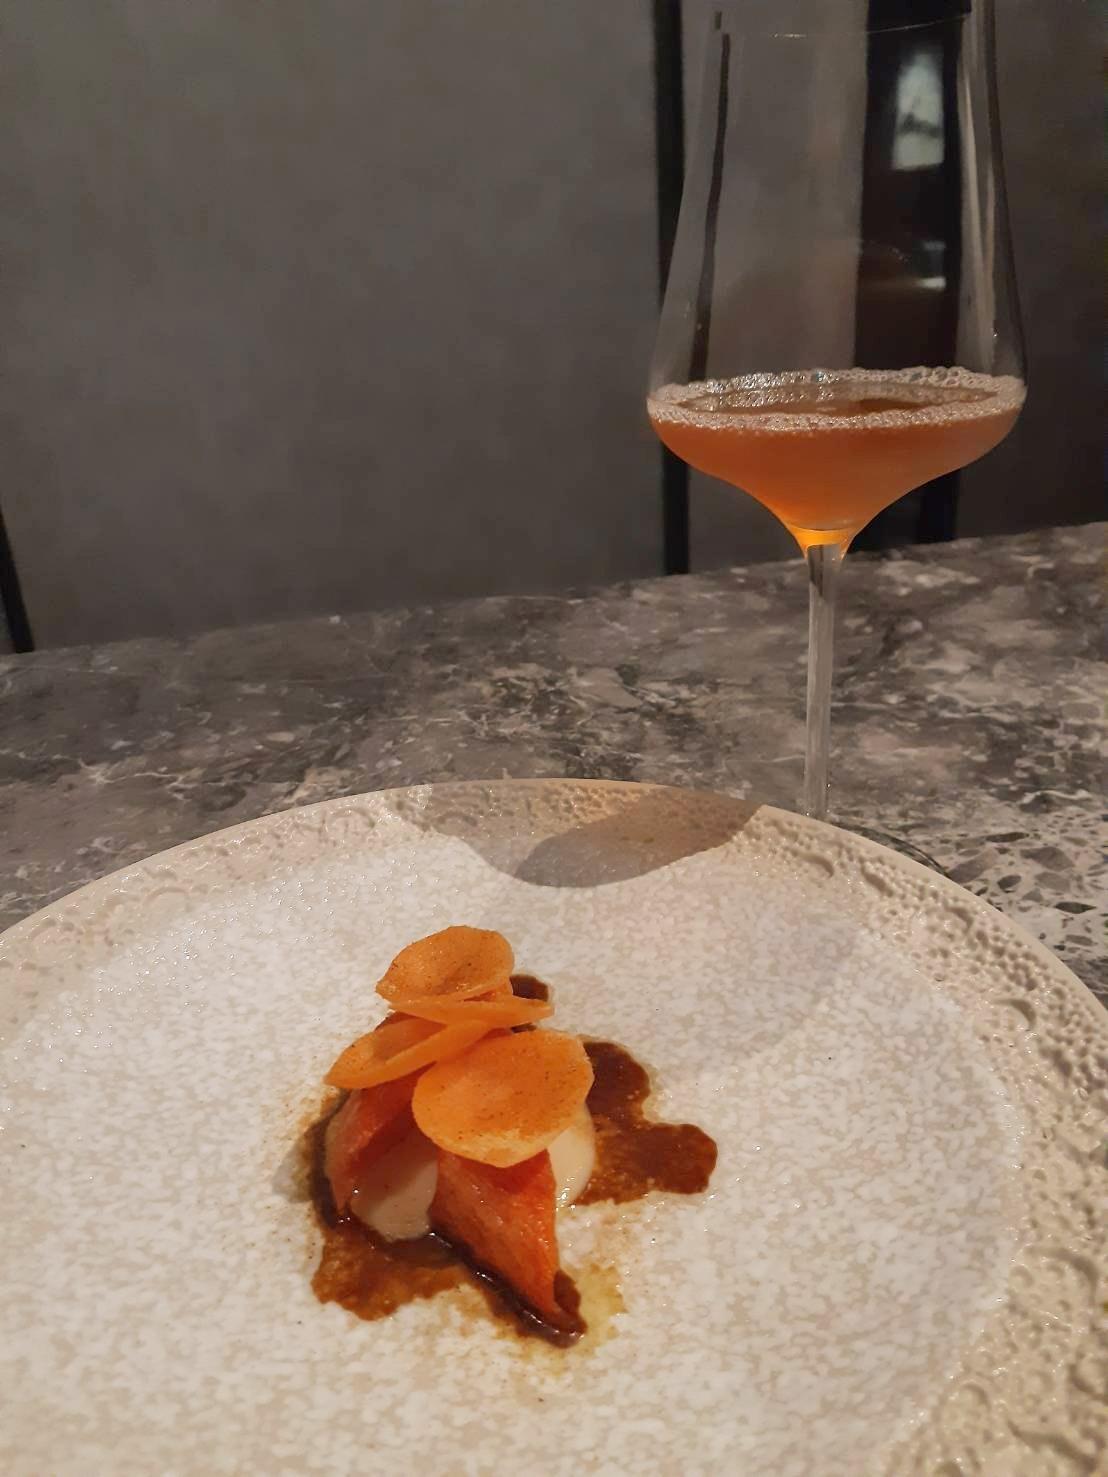 紅蘿蔔 夏威夷果仁 咖啡 carrot macadamia coffee kombucha 蘭 Orchid.jpg